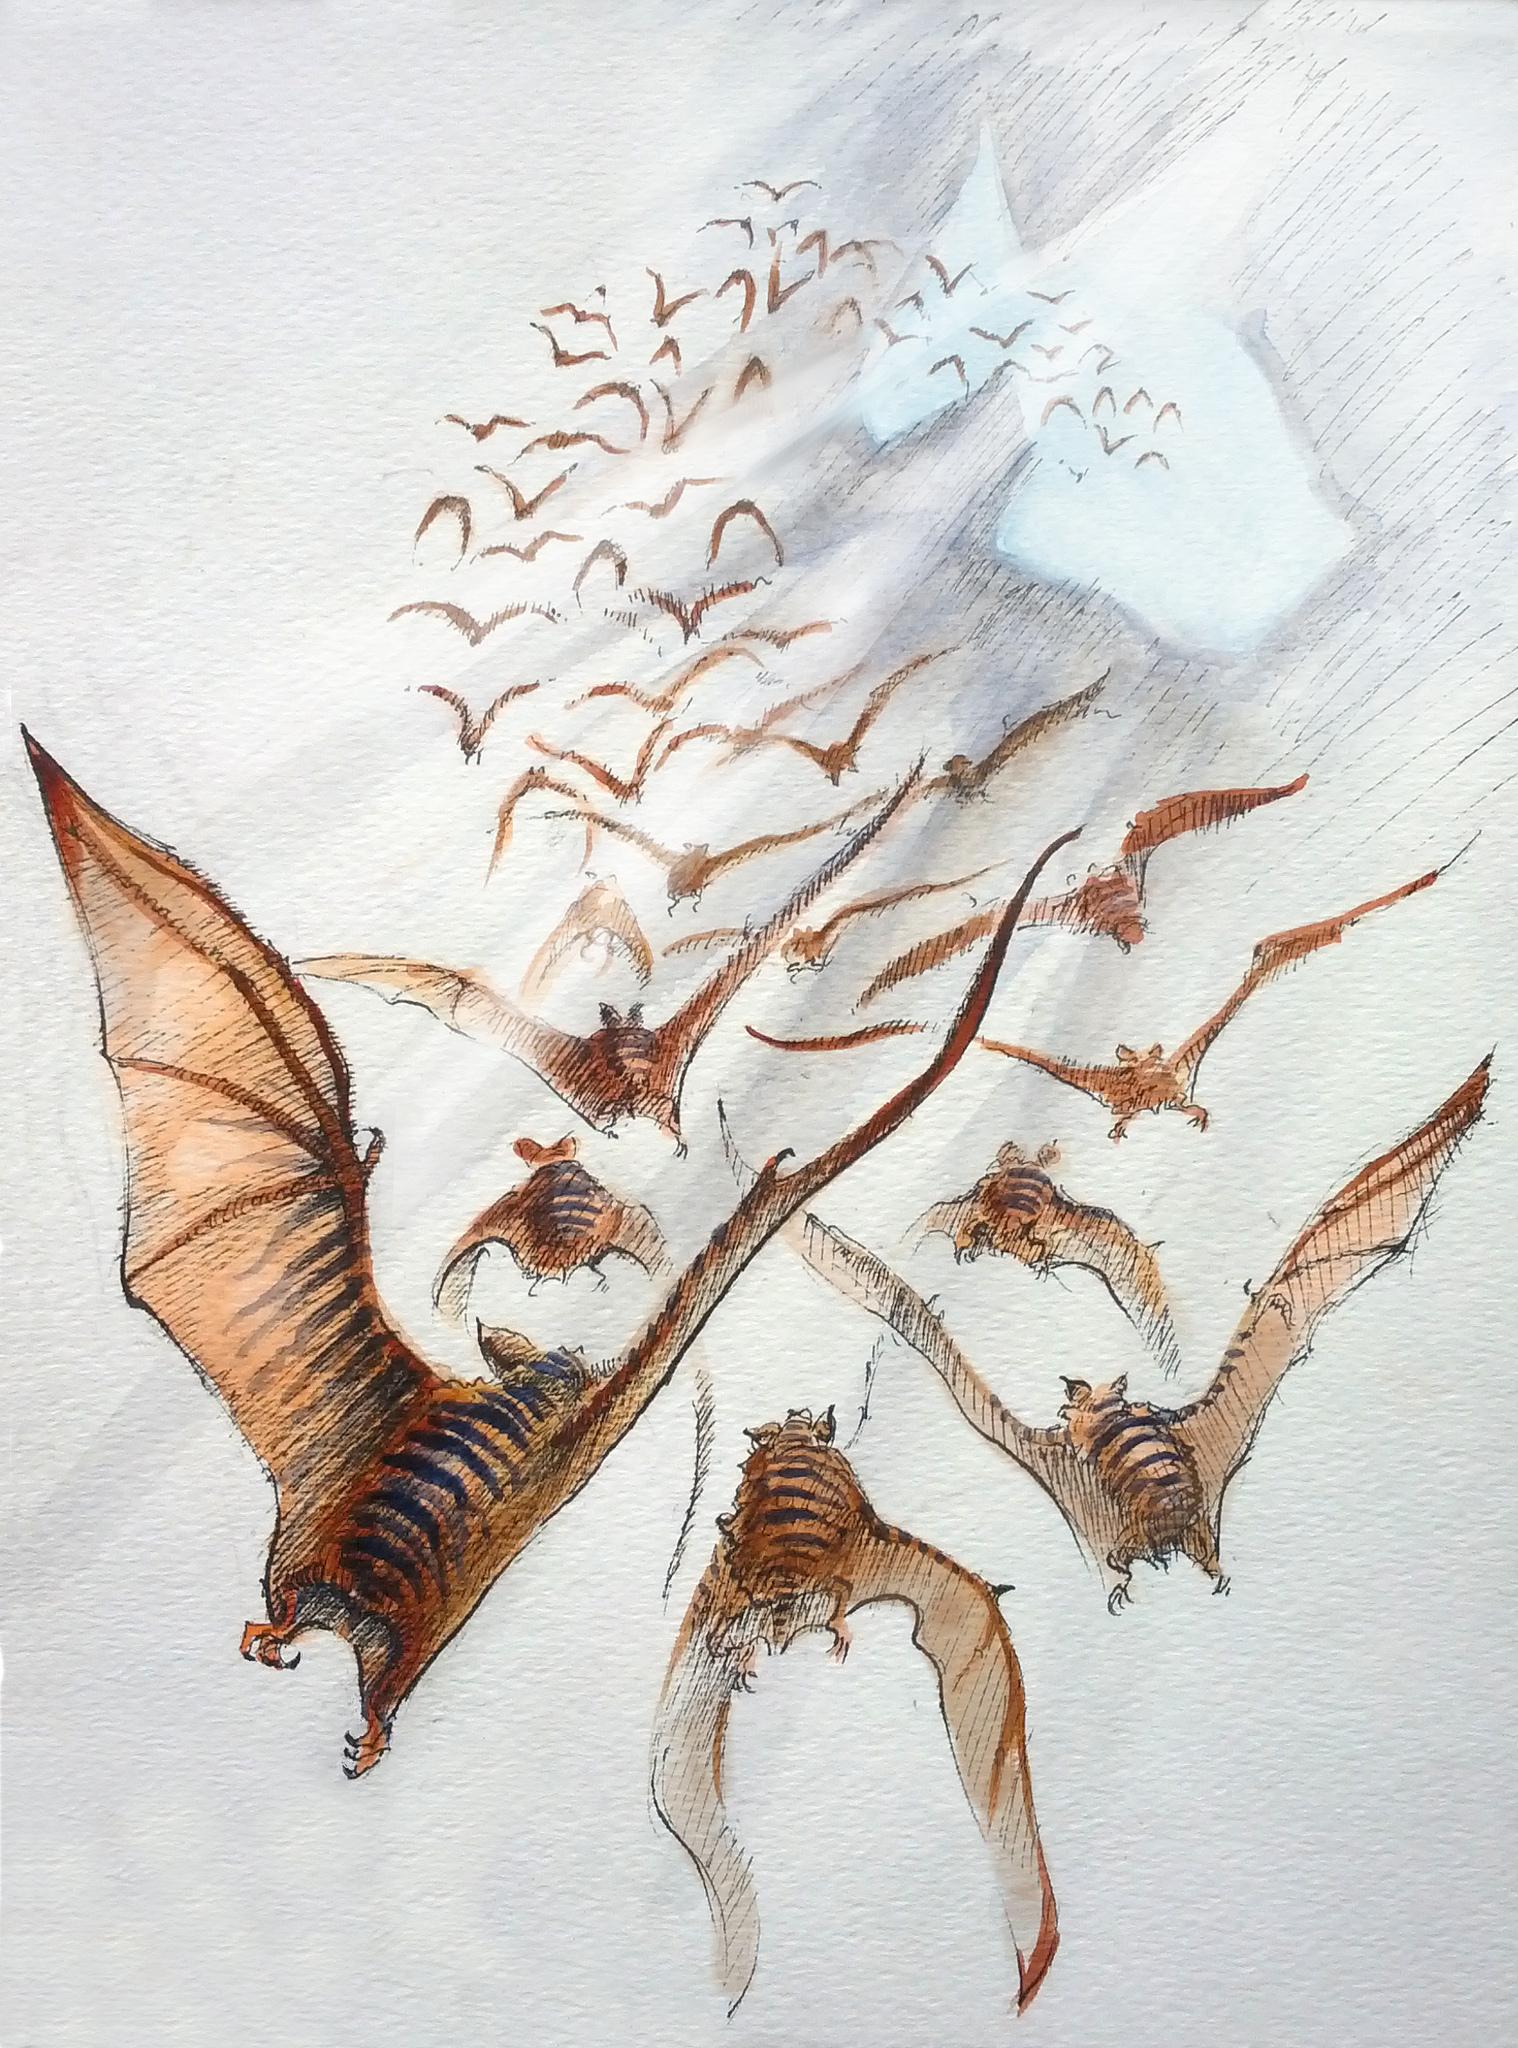 kavarian-tiger-bat-spaceotters.jpg